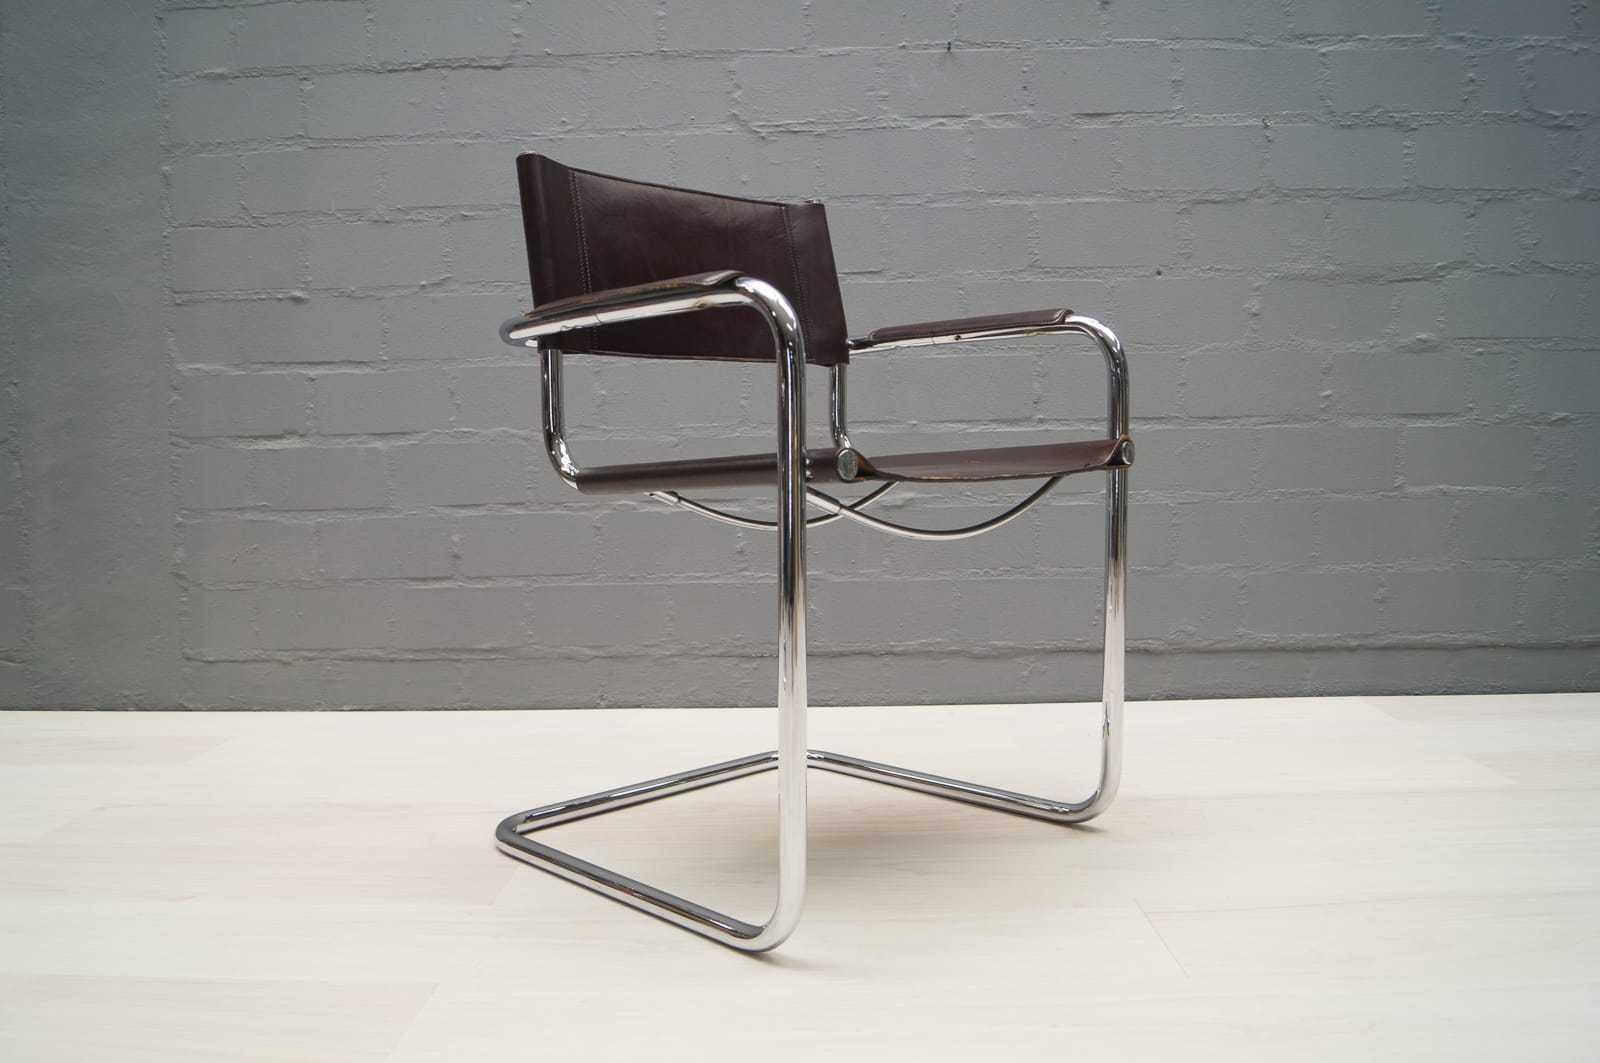 2x paar mart stam freischwinger stuhl chrom leder art deco bauhaus entwurf ebay. Black Bedroom Furniture Sets. Home Design Ideas